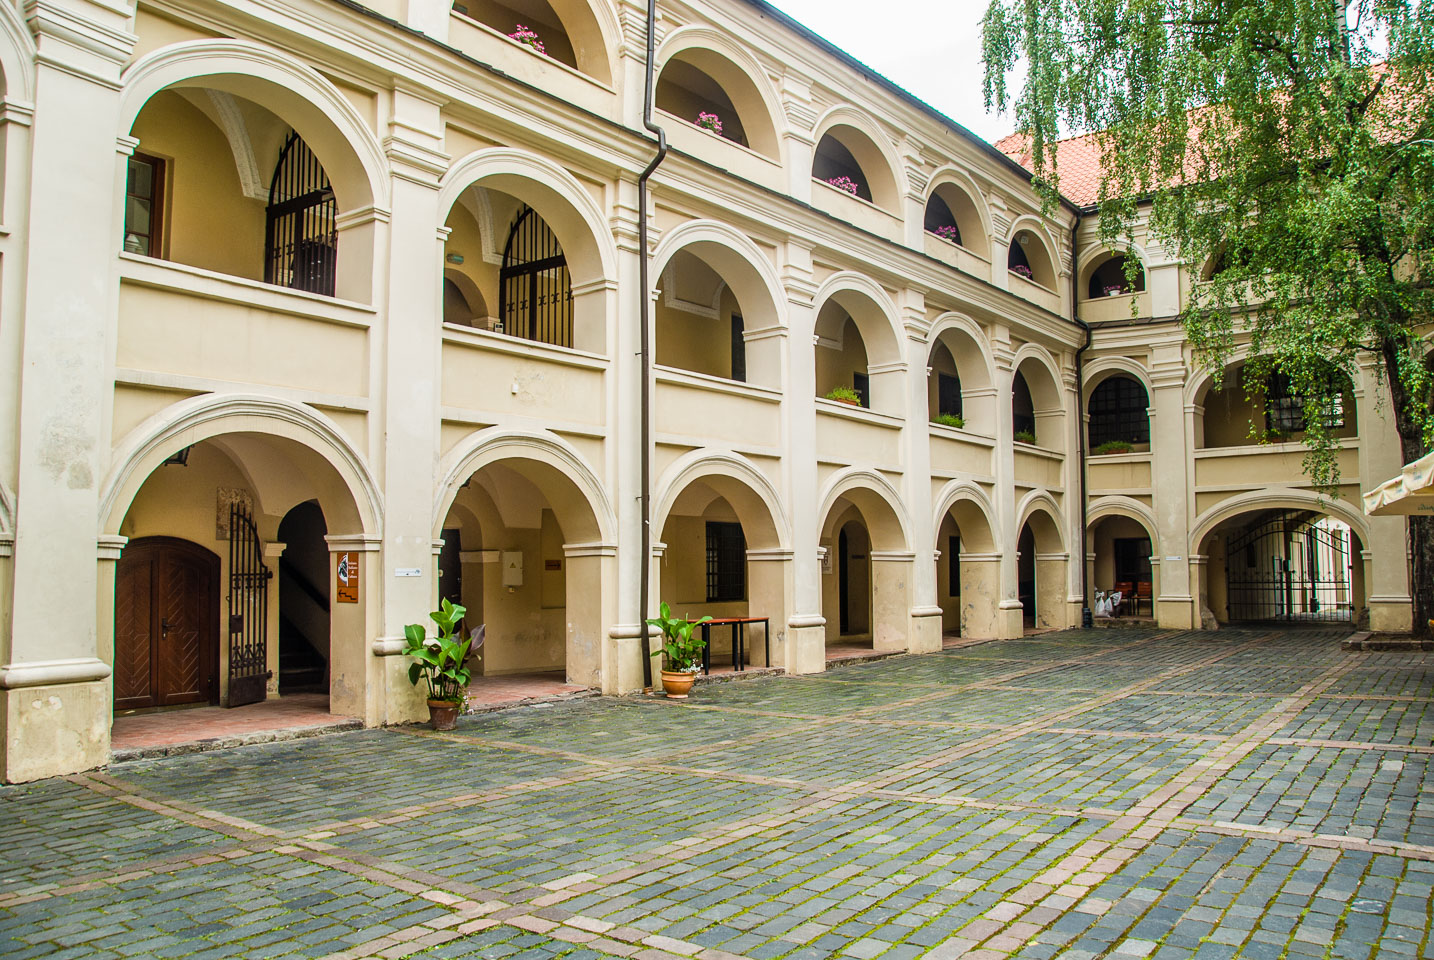 LI080127-The-Alumnatas-Courtyard-in-Vilnius.jpg